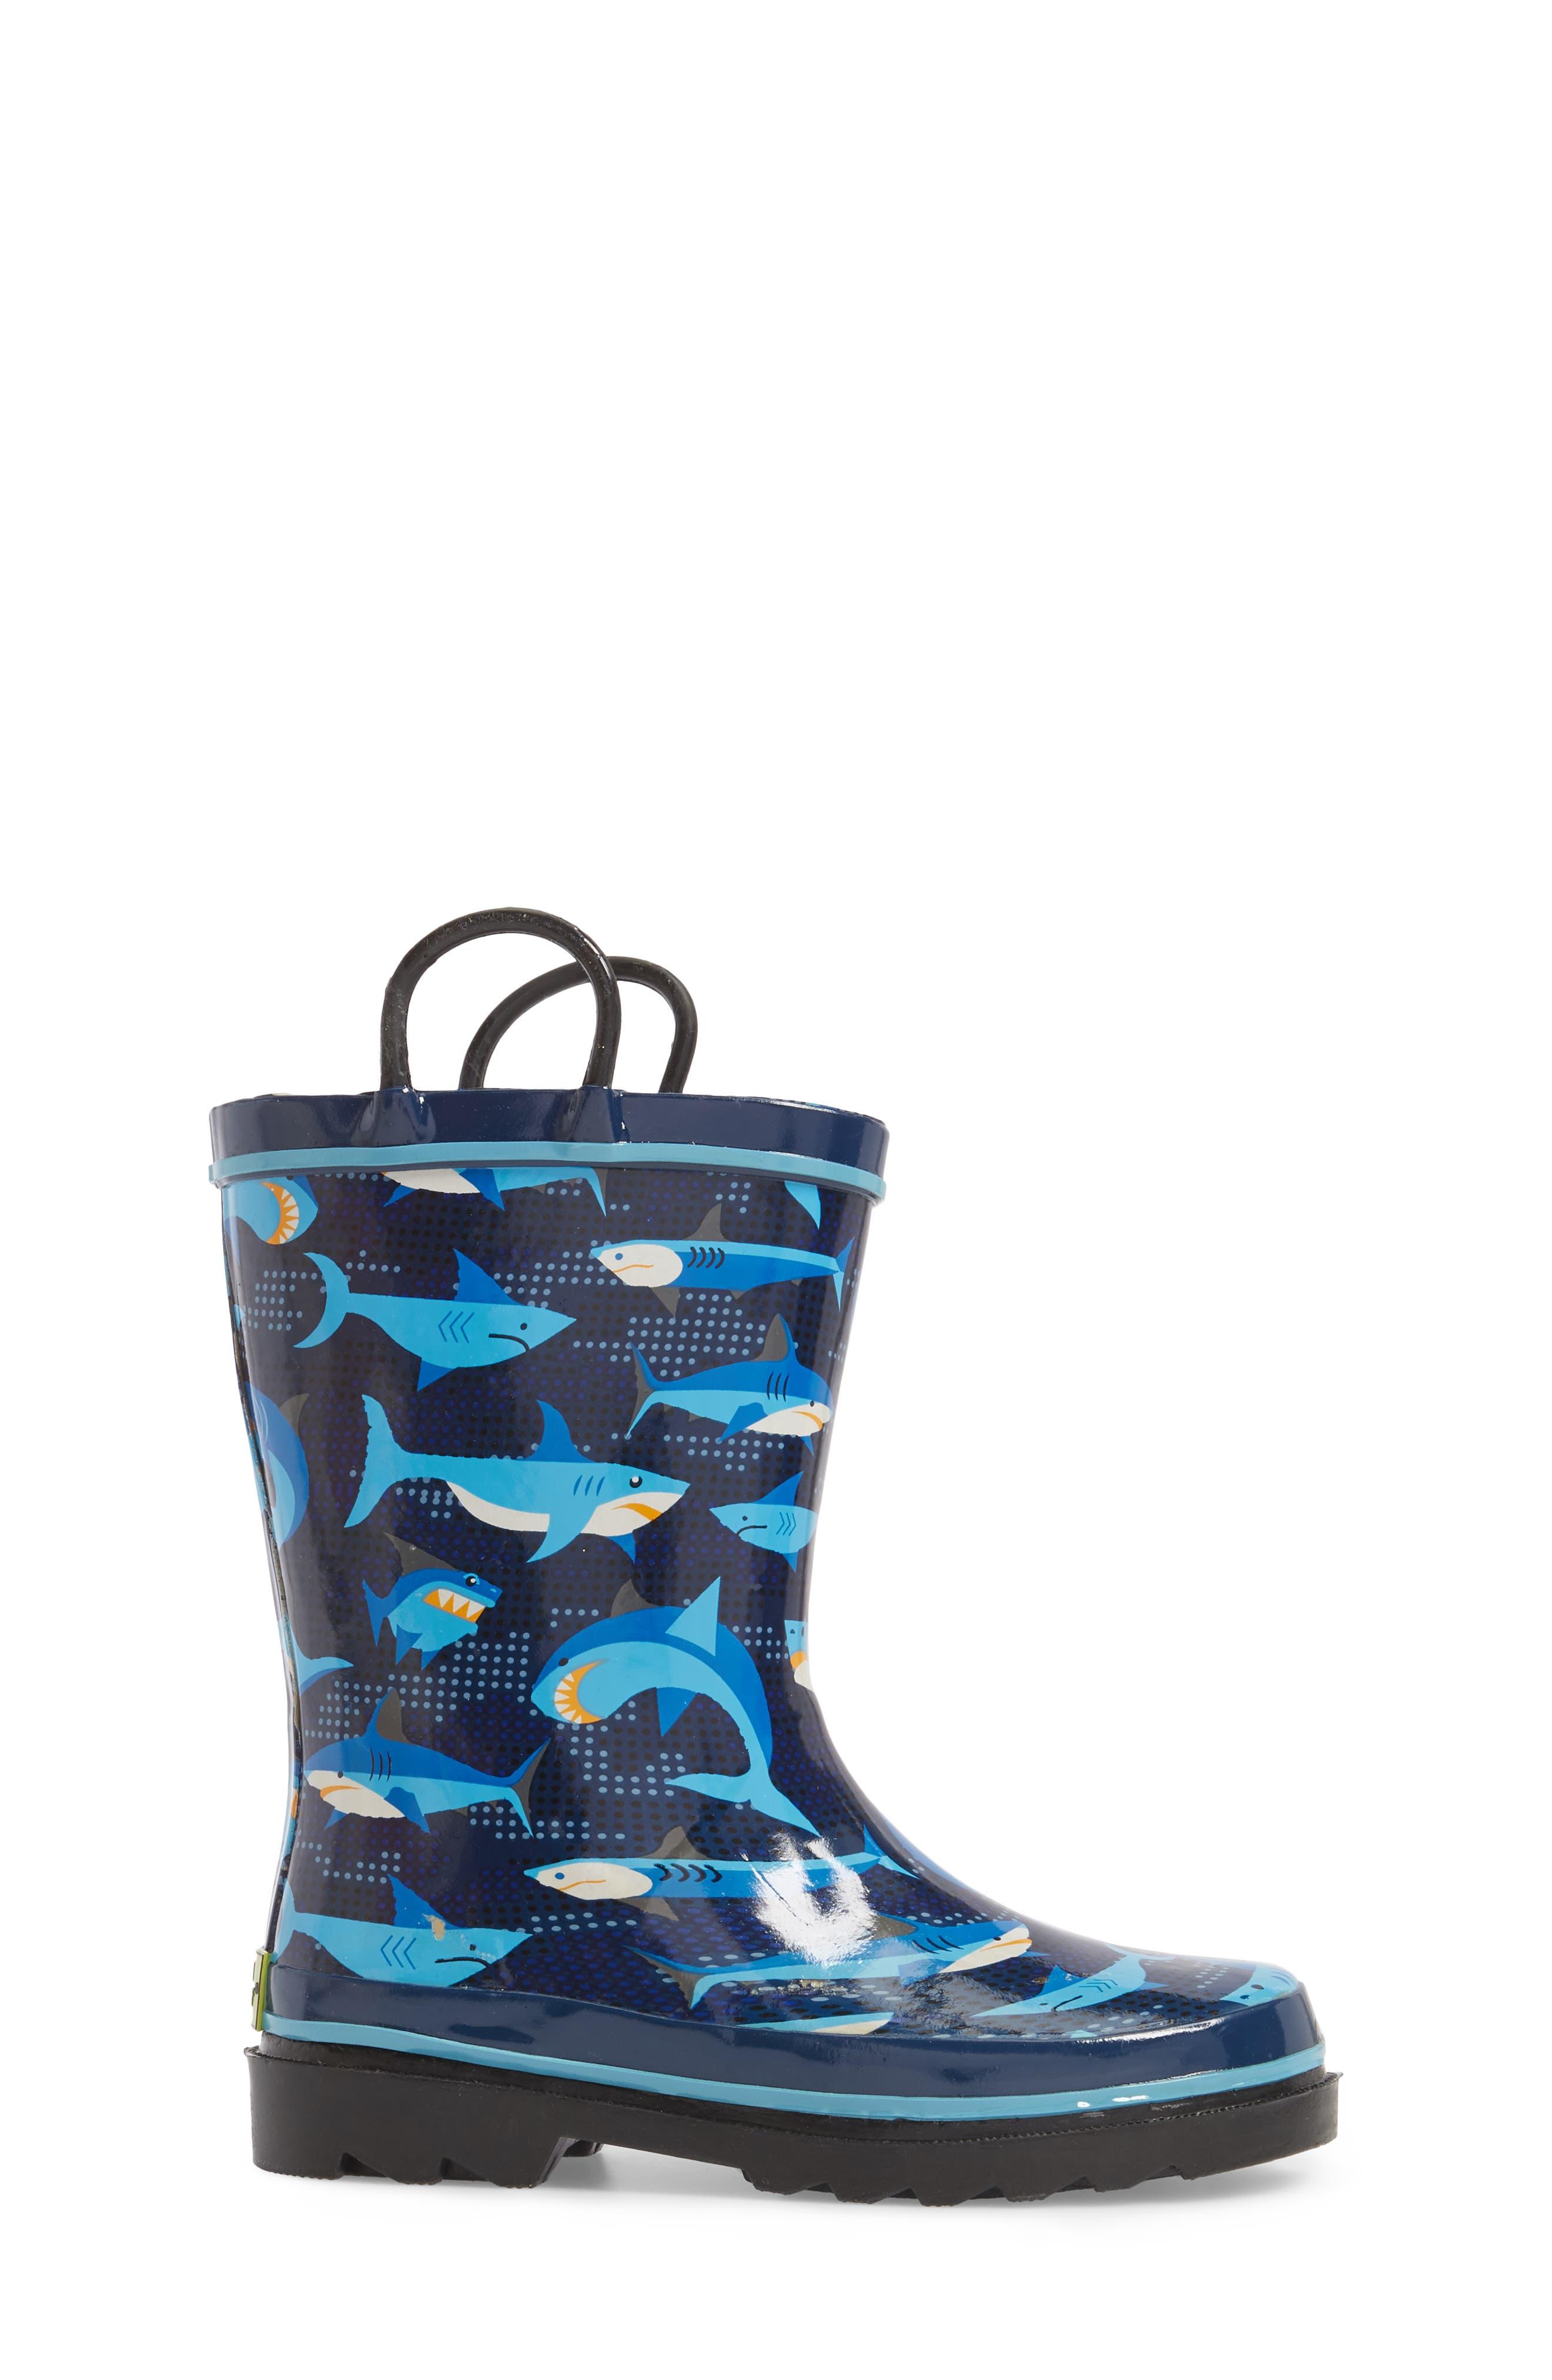 Pixel Shark Camo Rain Boot,                             Alternate thumbnail 3, color,                             Navy